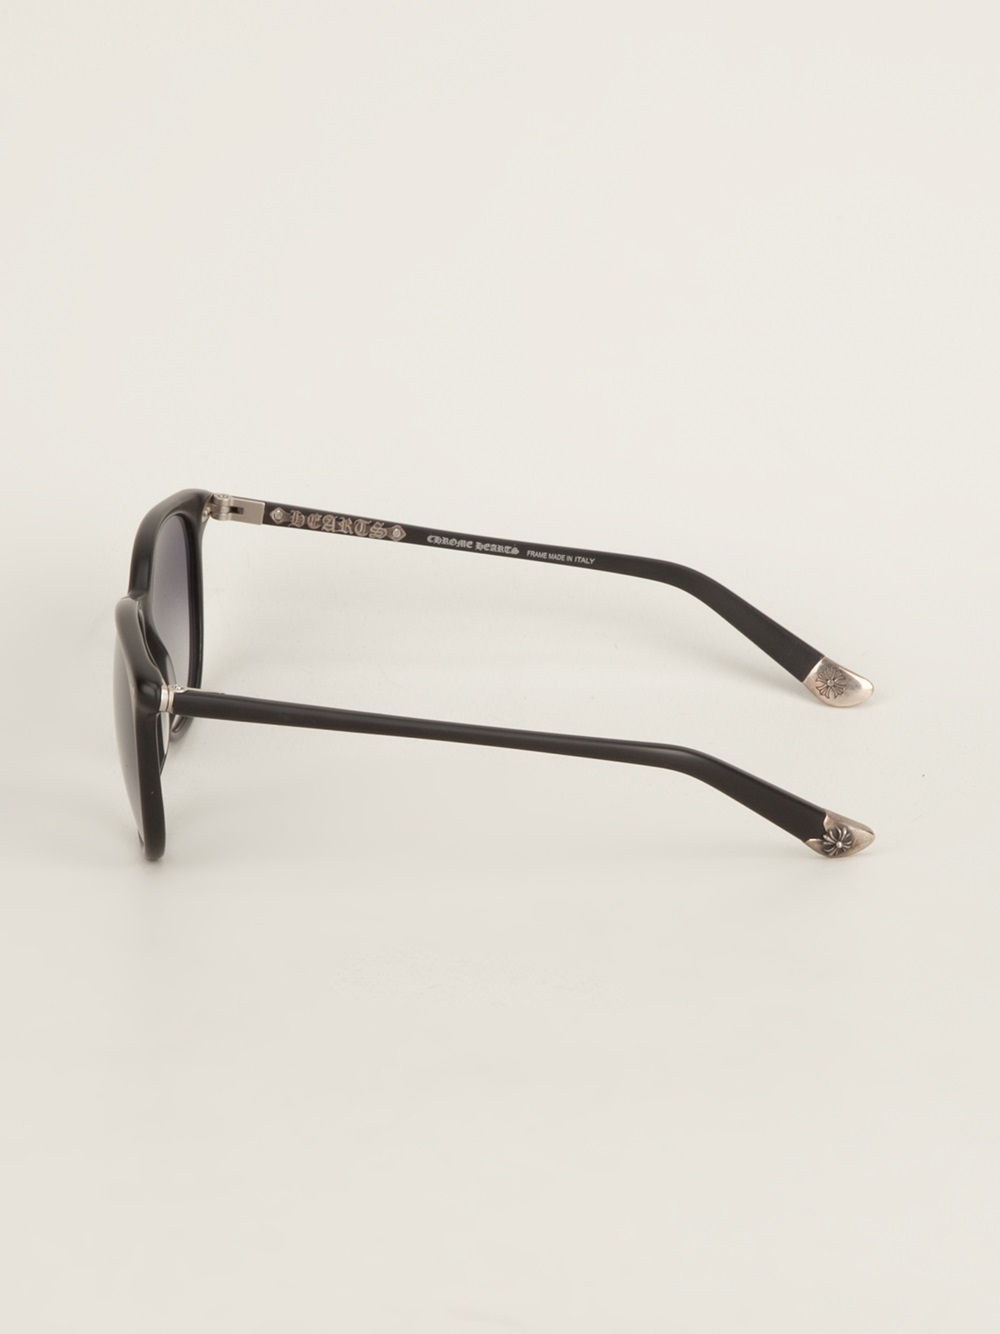 117b51fba85b Chrome Hearts Men s Sunglasses